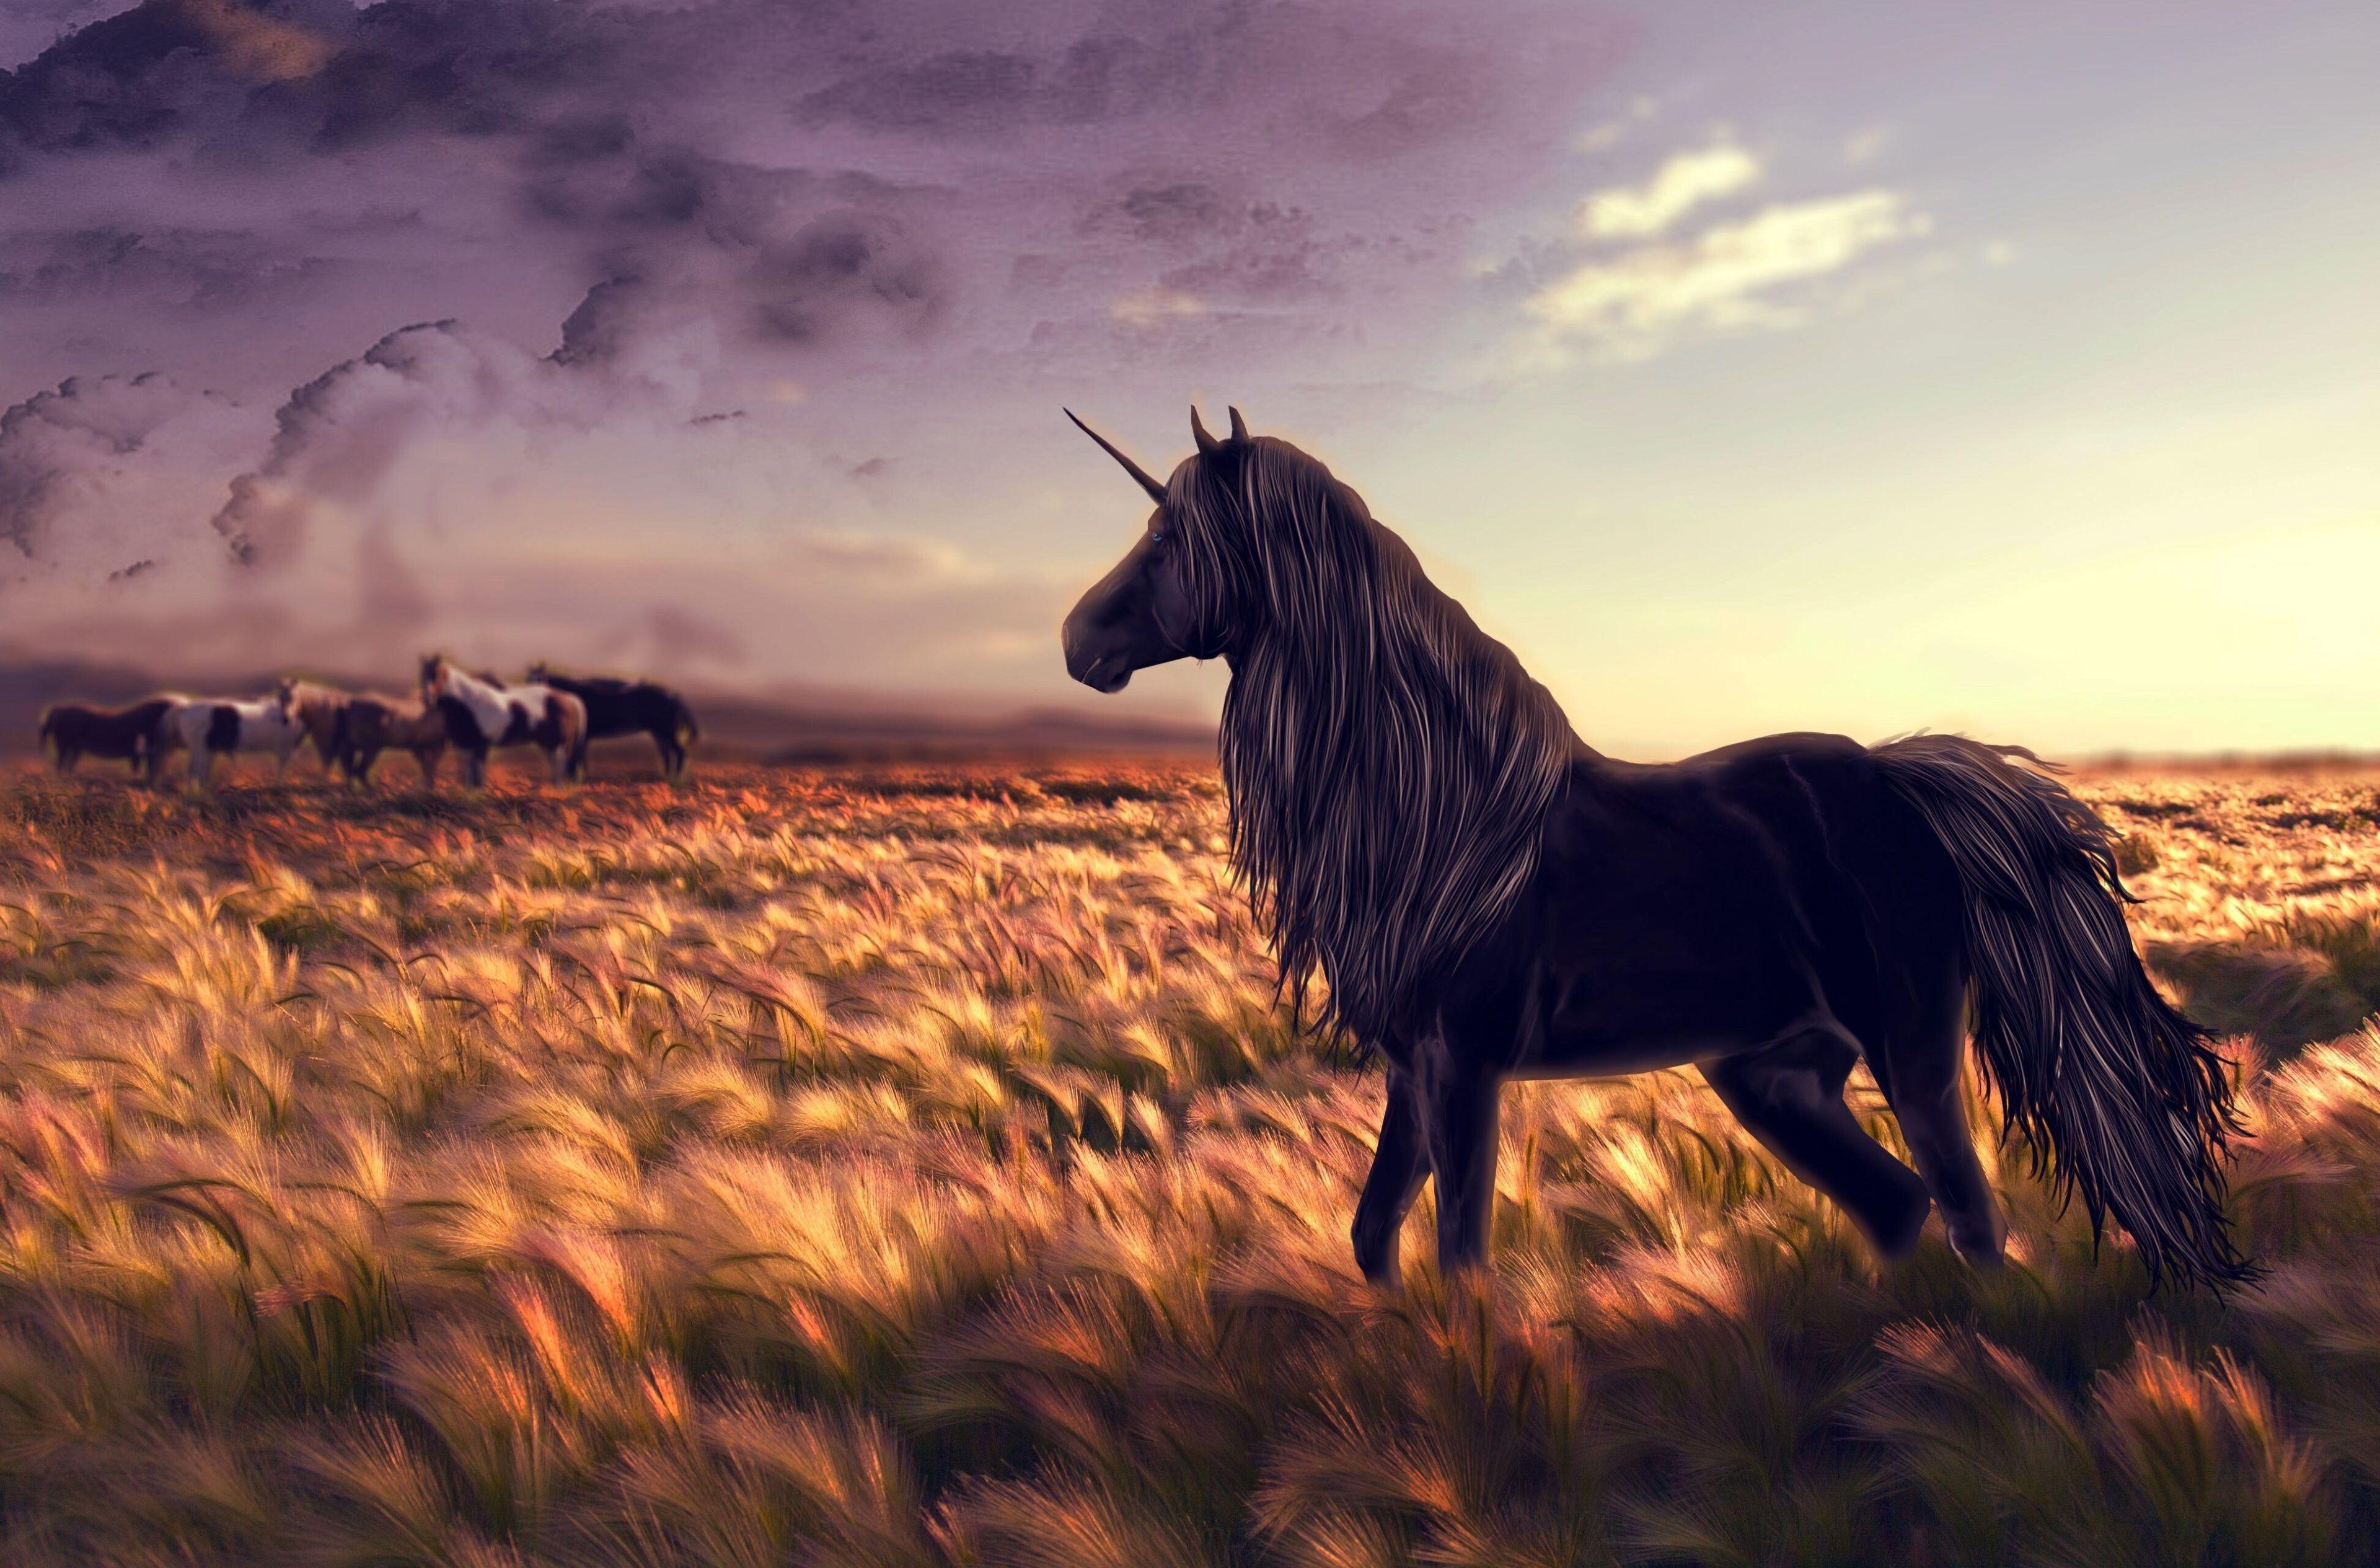 3840x2530 Unicorn 4k Windows Hd Wallpaper Free Download Unicorn Wallpaper Unicorn Backgrounds Unicorn Fantasy